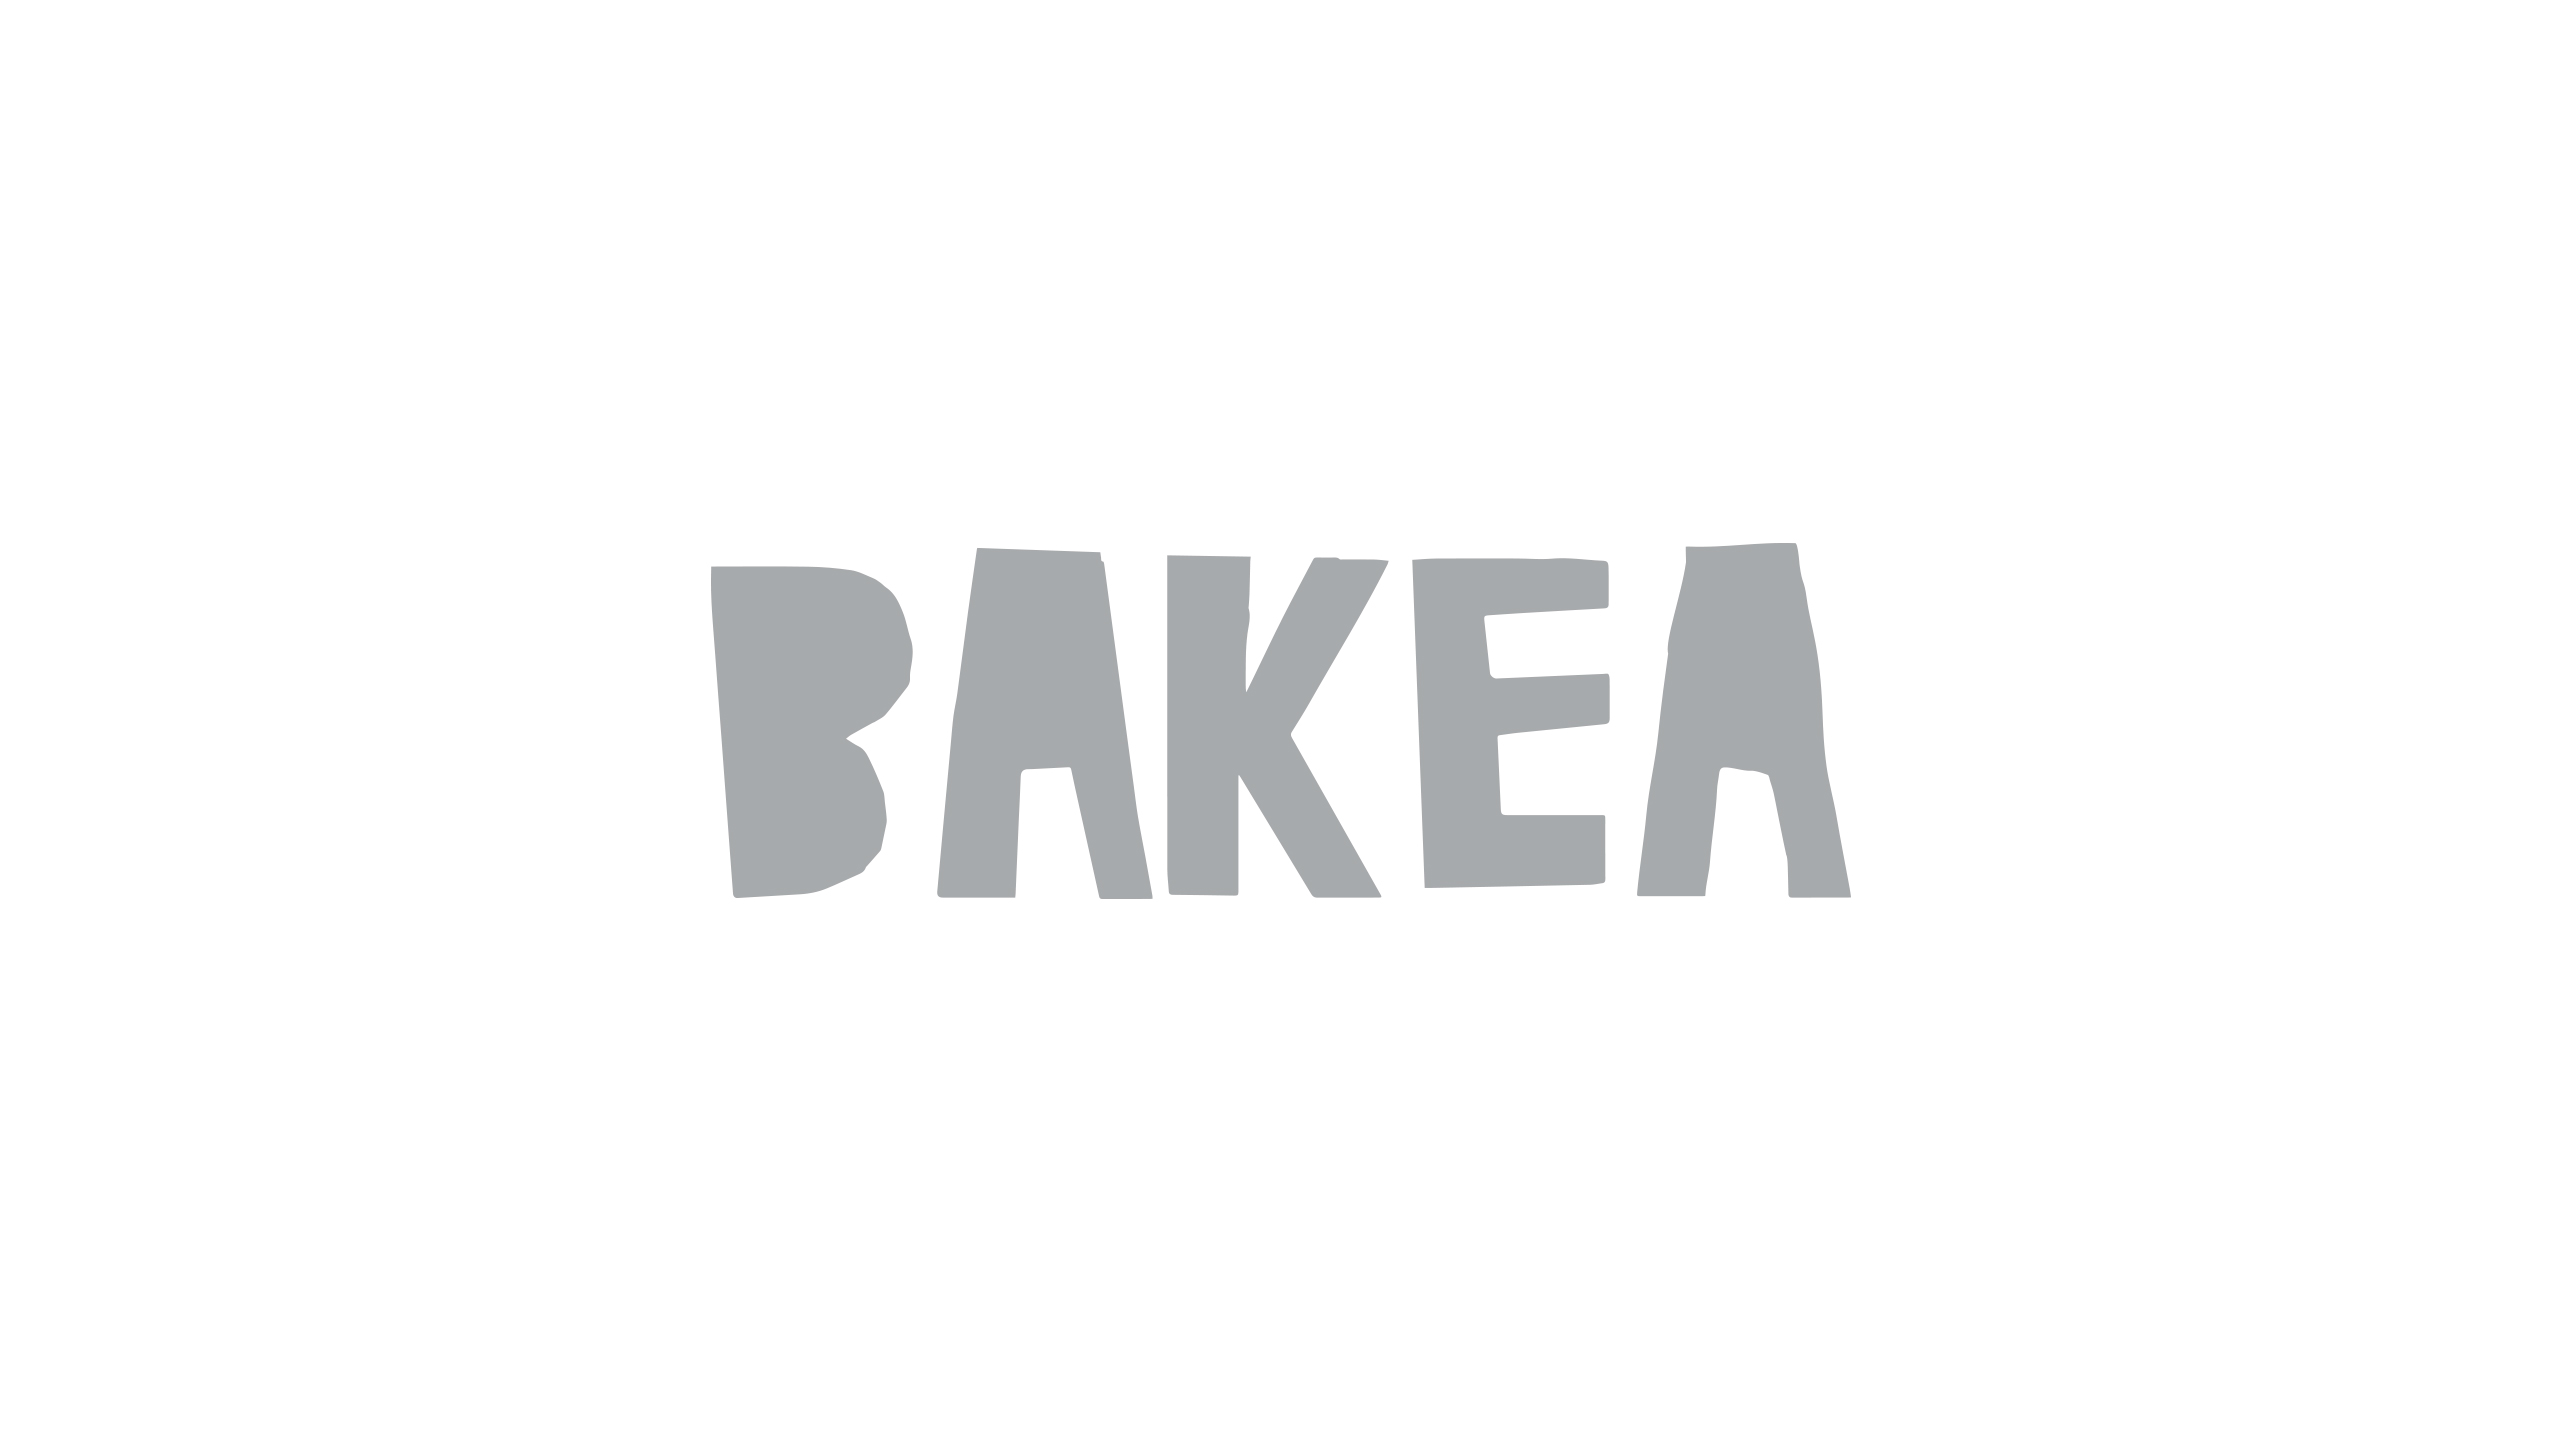 kamikaze_identidad_bakea_03